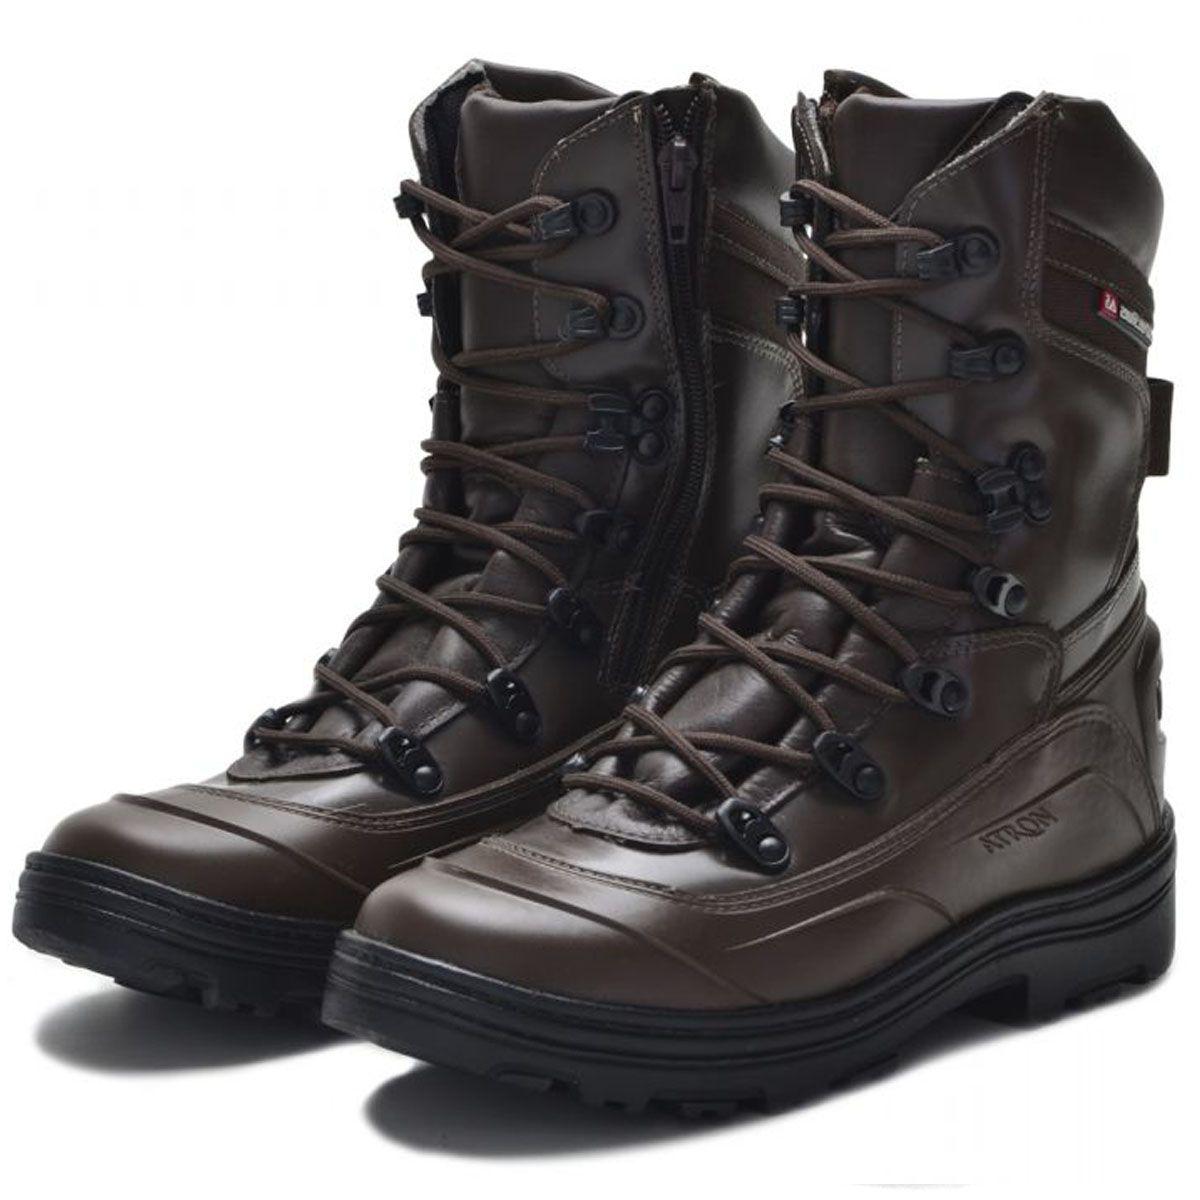 Coturno tático militar de couro Atron Shoes 289 Café